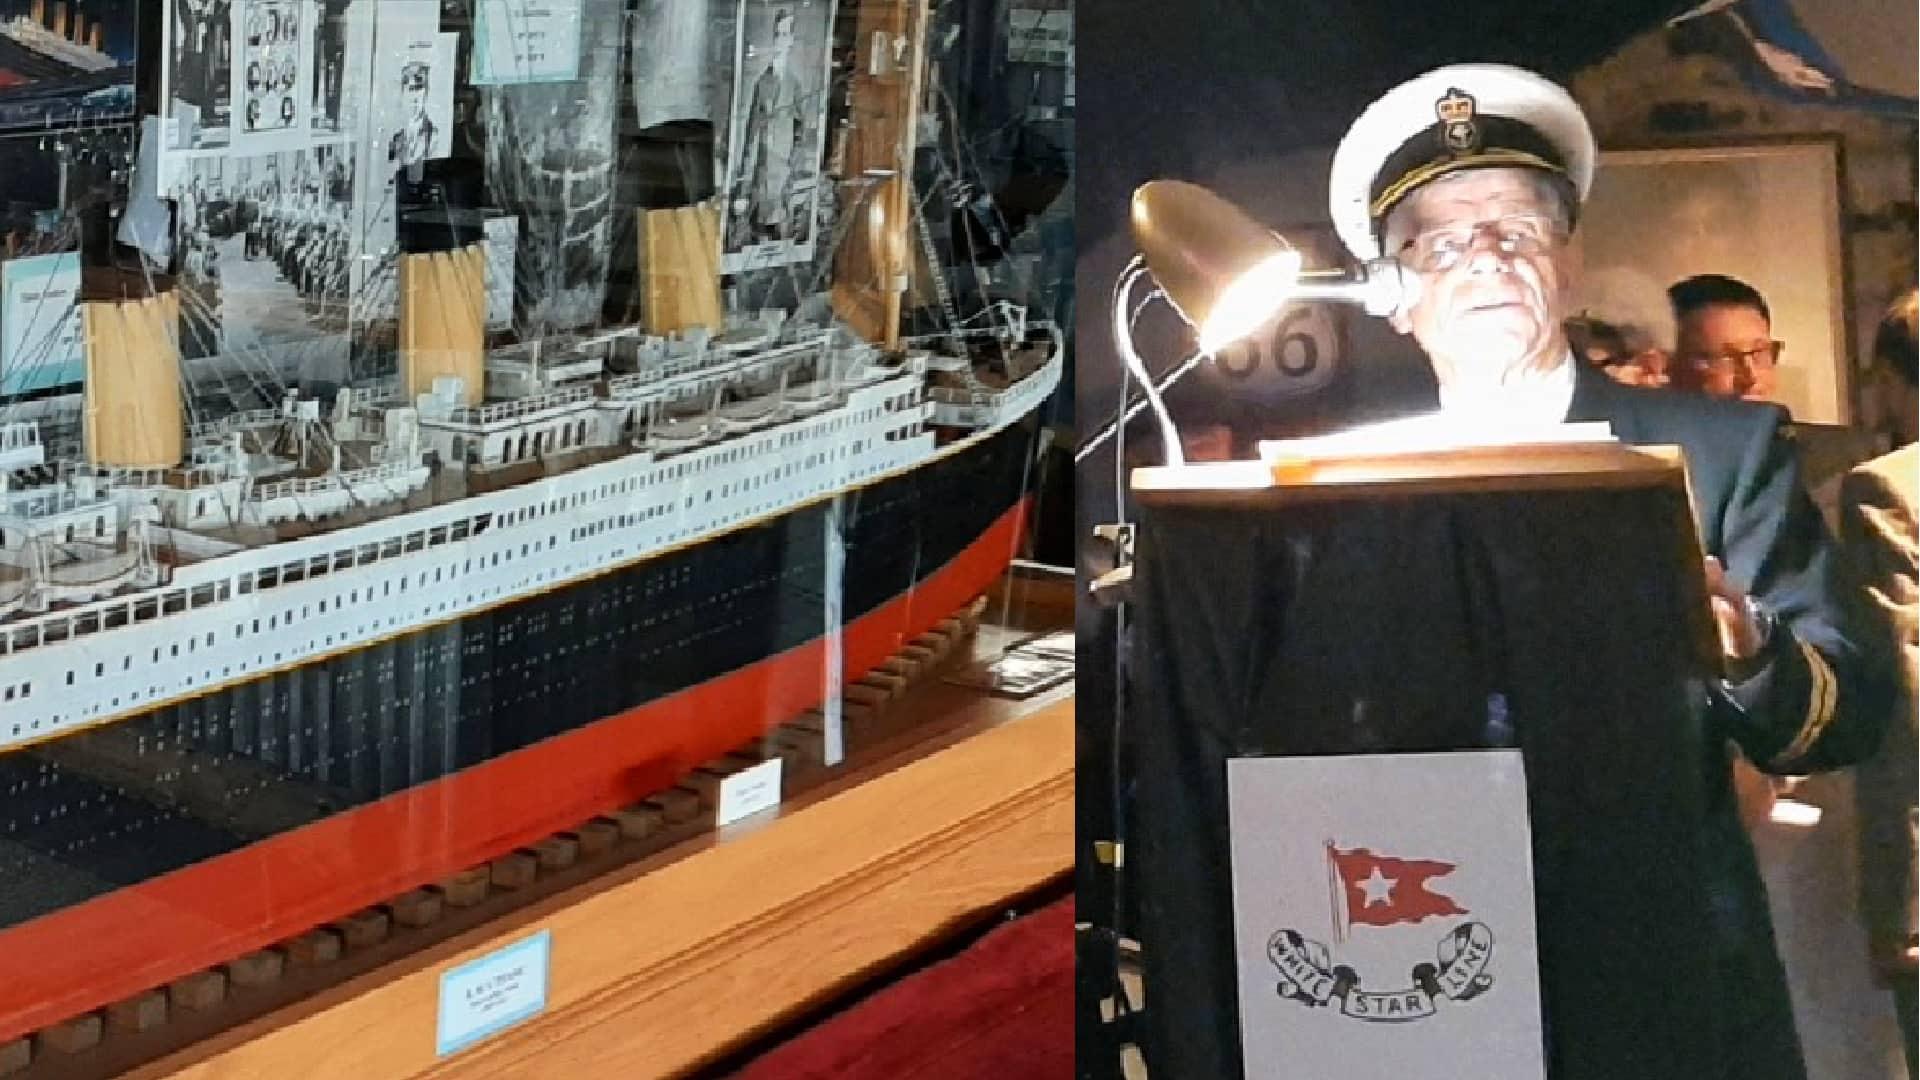 Musician Ray Johnson unveils his massive model of the Titanic